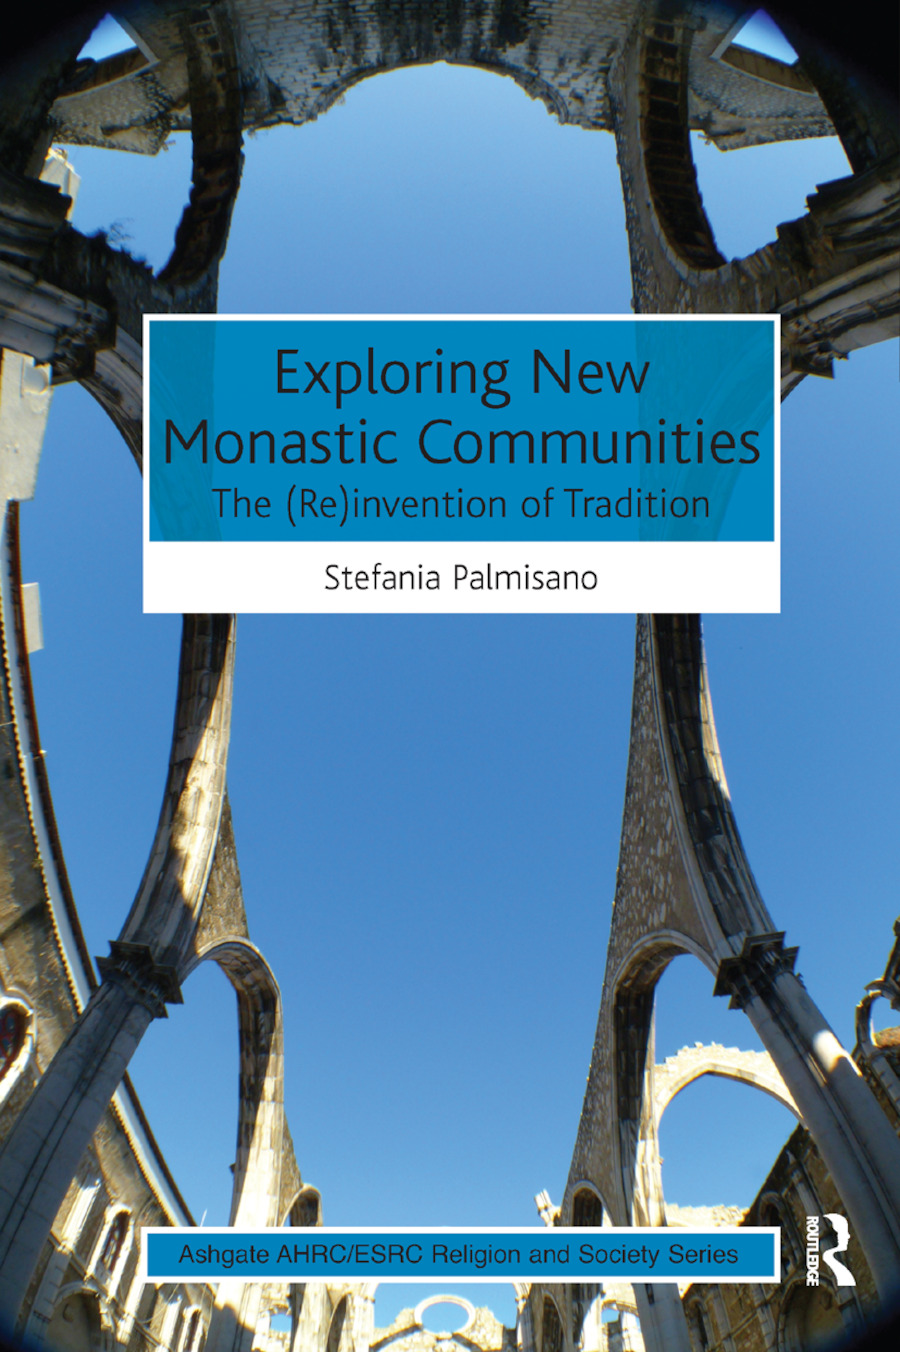 Exploring New Monastic Communities